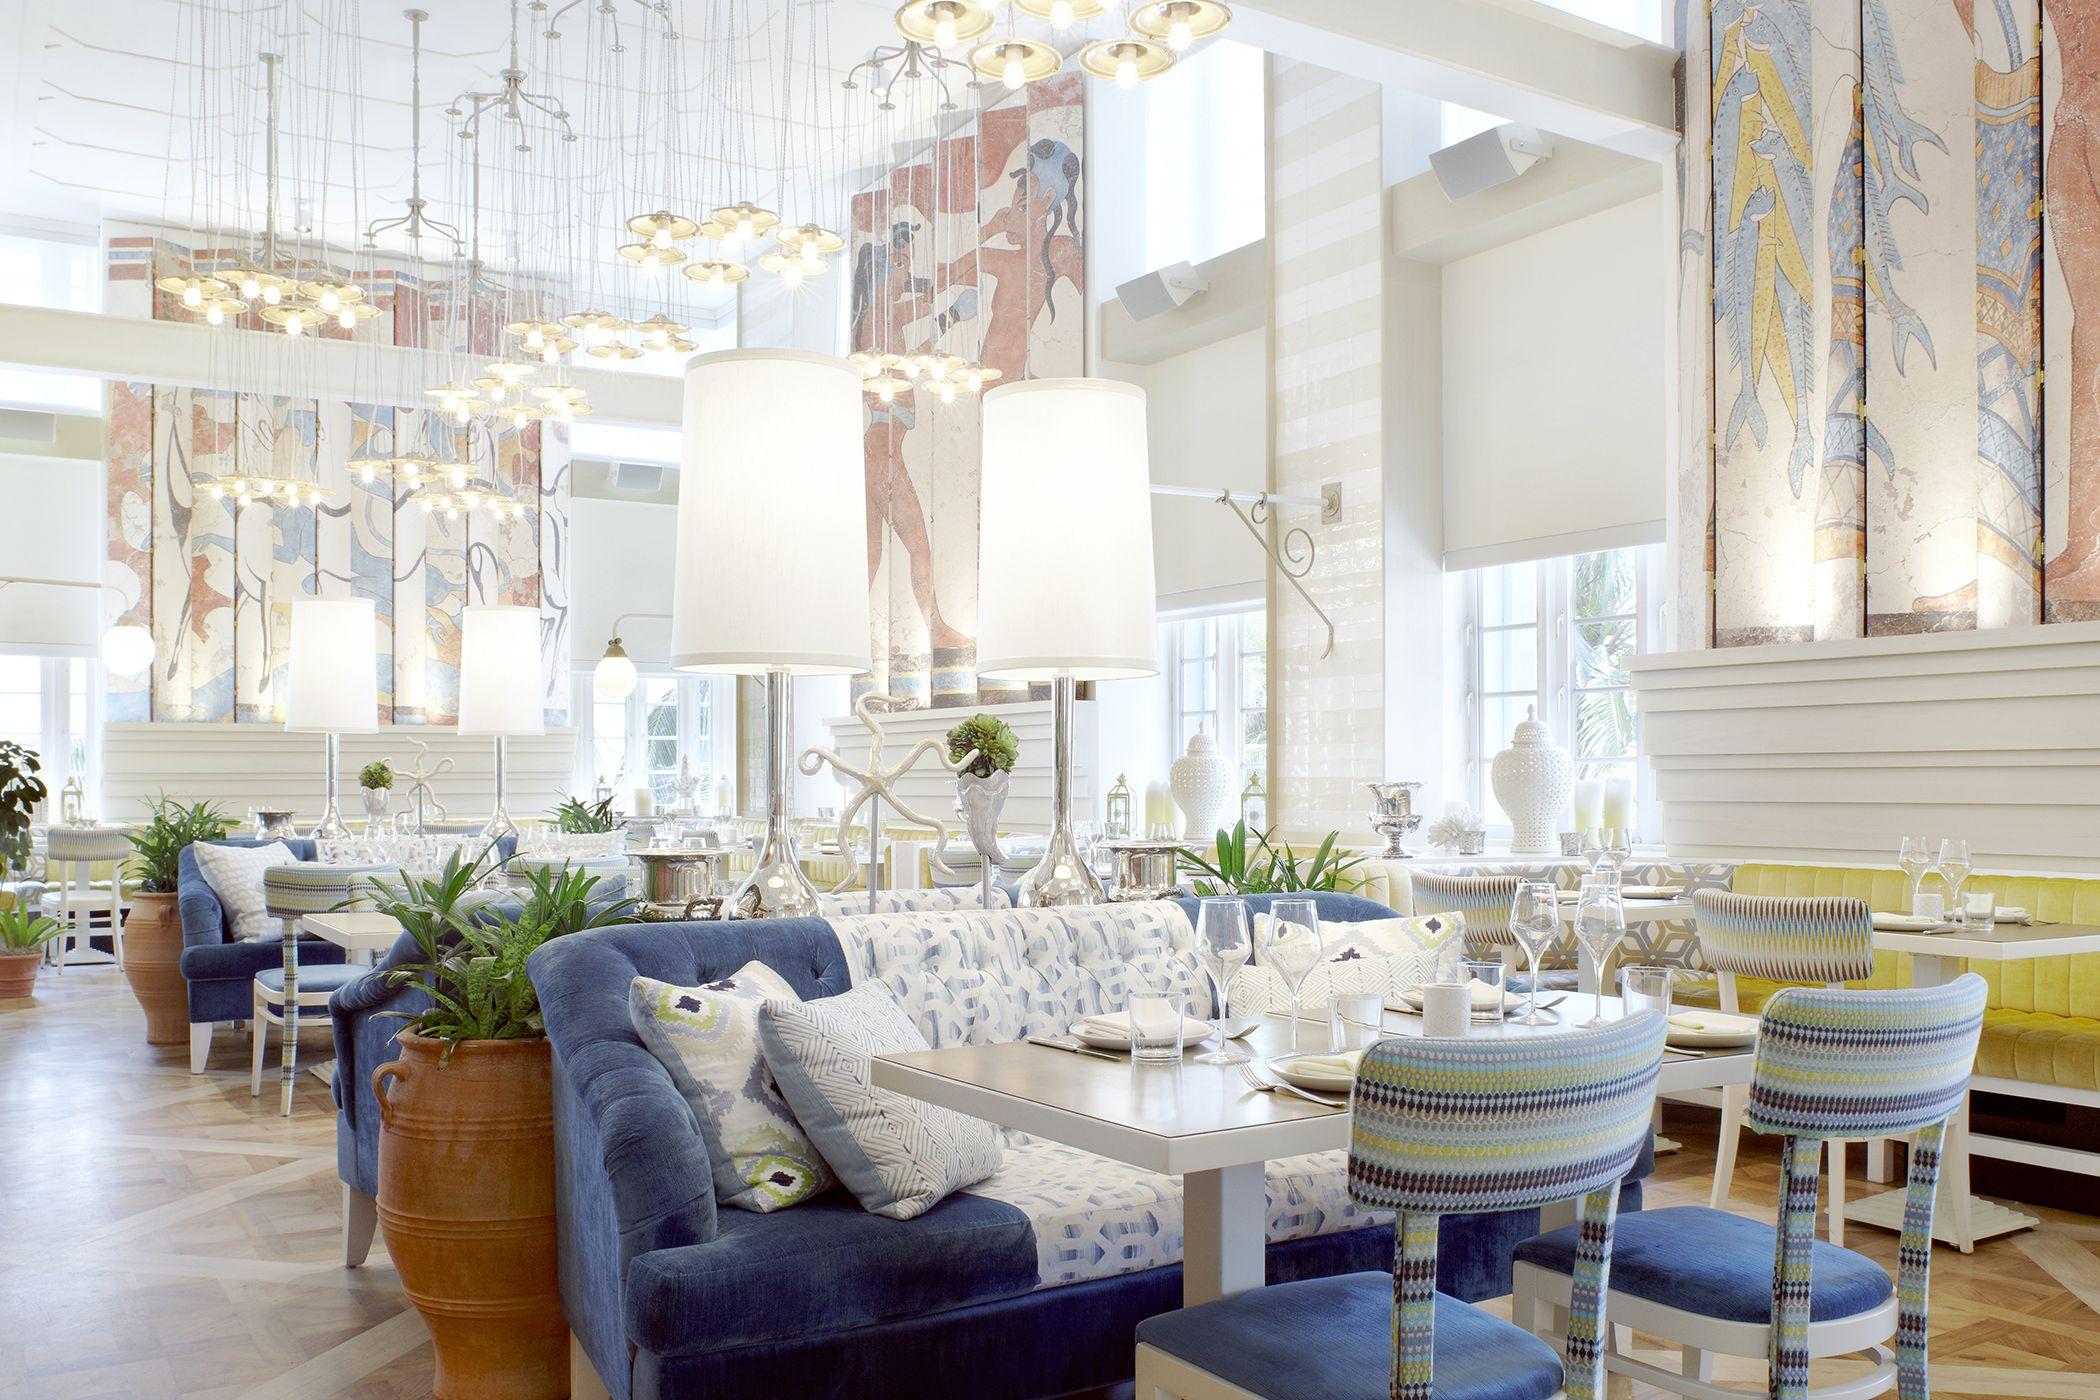 Byblos Miami, South Beach, Miami, Florida, USA. Interior Design by Studio Munge.   Follow @studiomunge   www.studiomunge.com _______________________________________________ #design #interior #hospitality #restaurant #byblos #miami #inkentertainment #studio #munge #studiomunge #decor #inspiration #lounge #artdeco #vibe #summer #fresh #dinning #room #pattern #colour